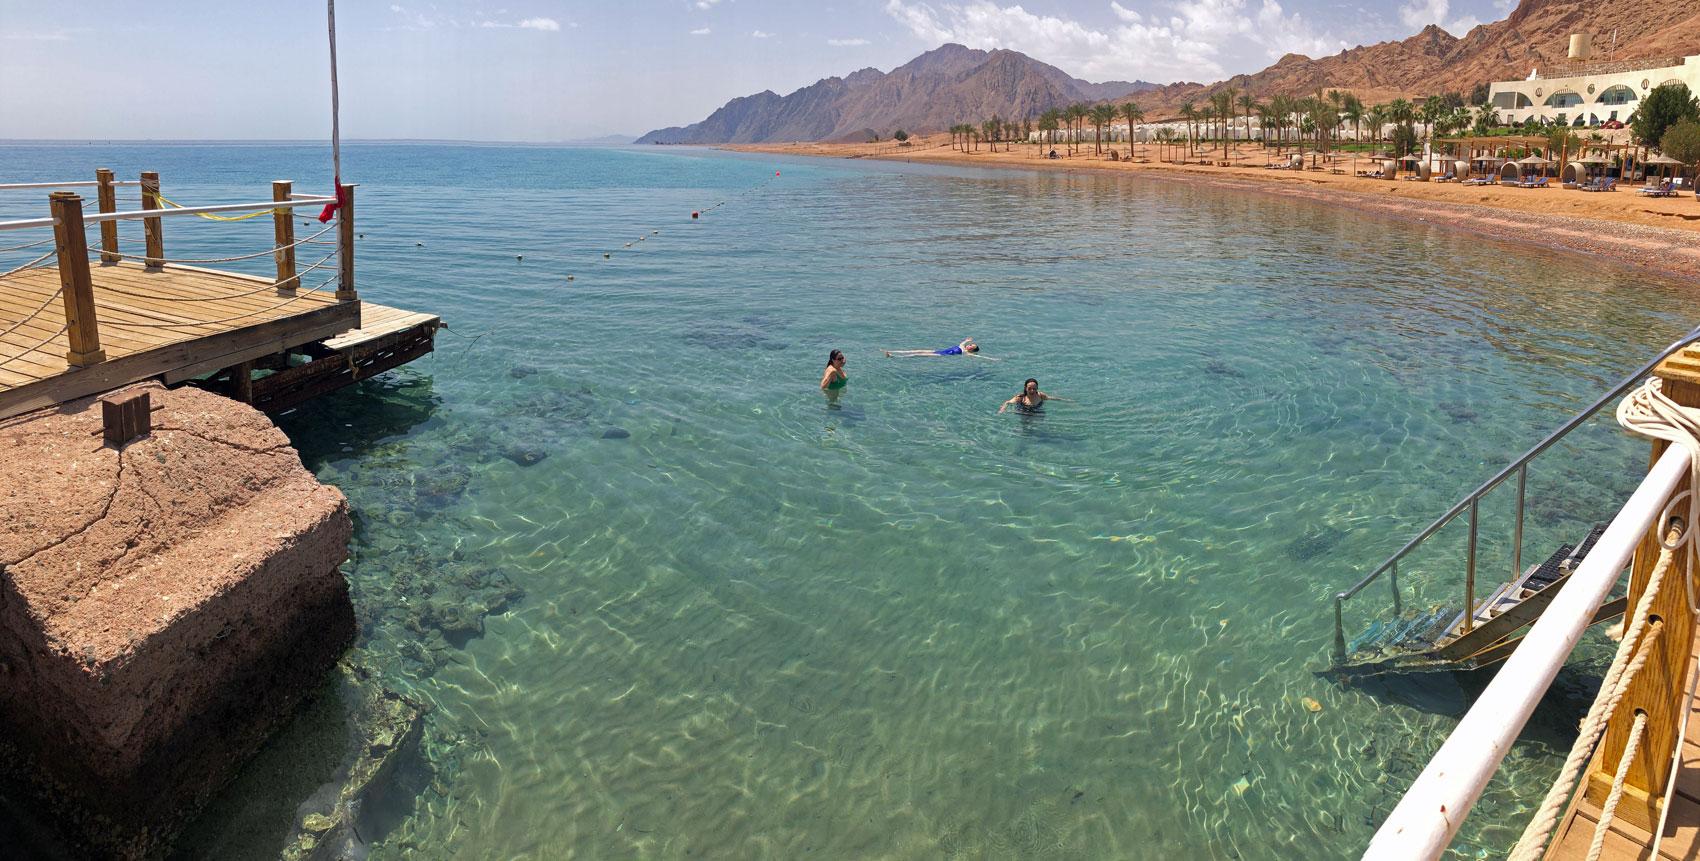 Gulf of Aqaba